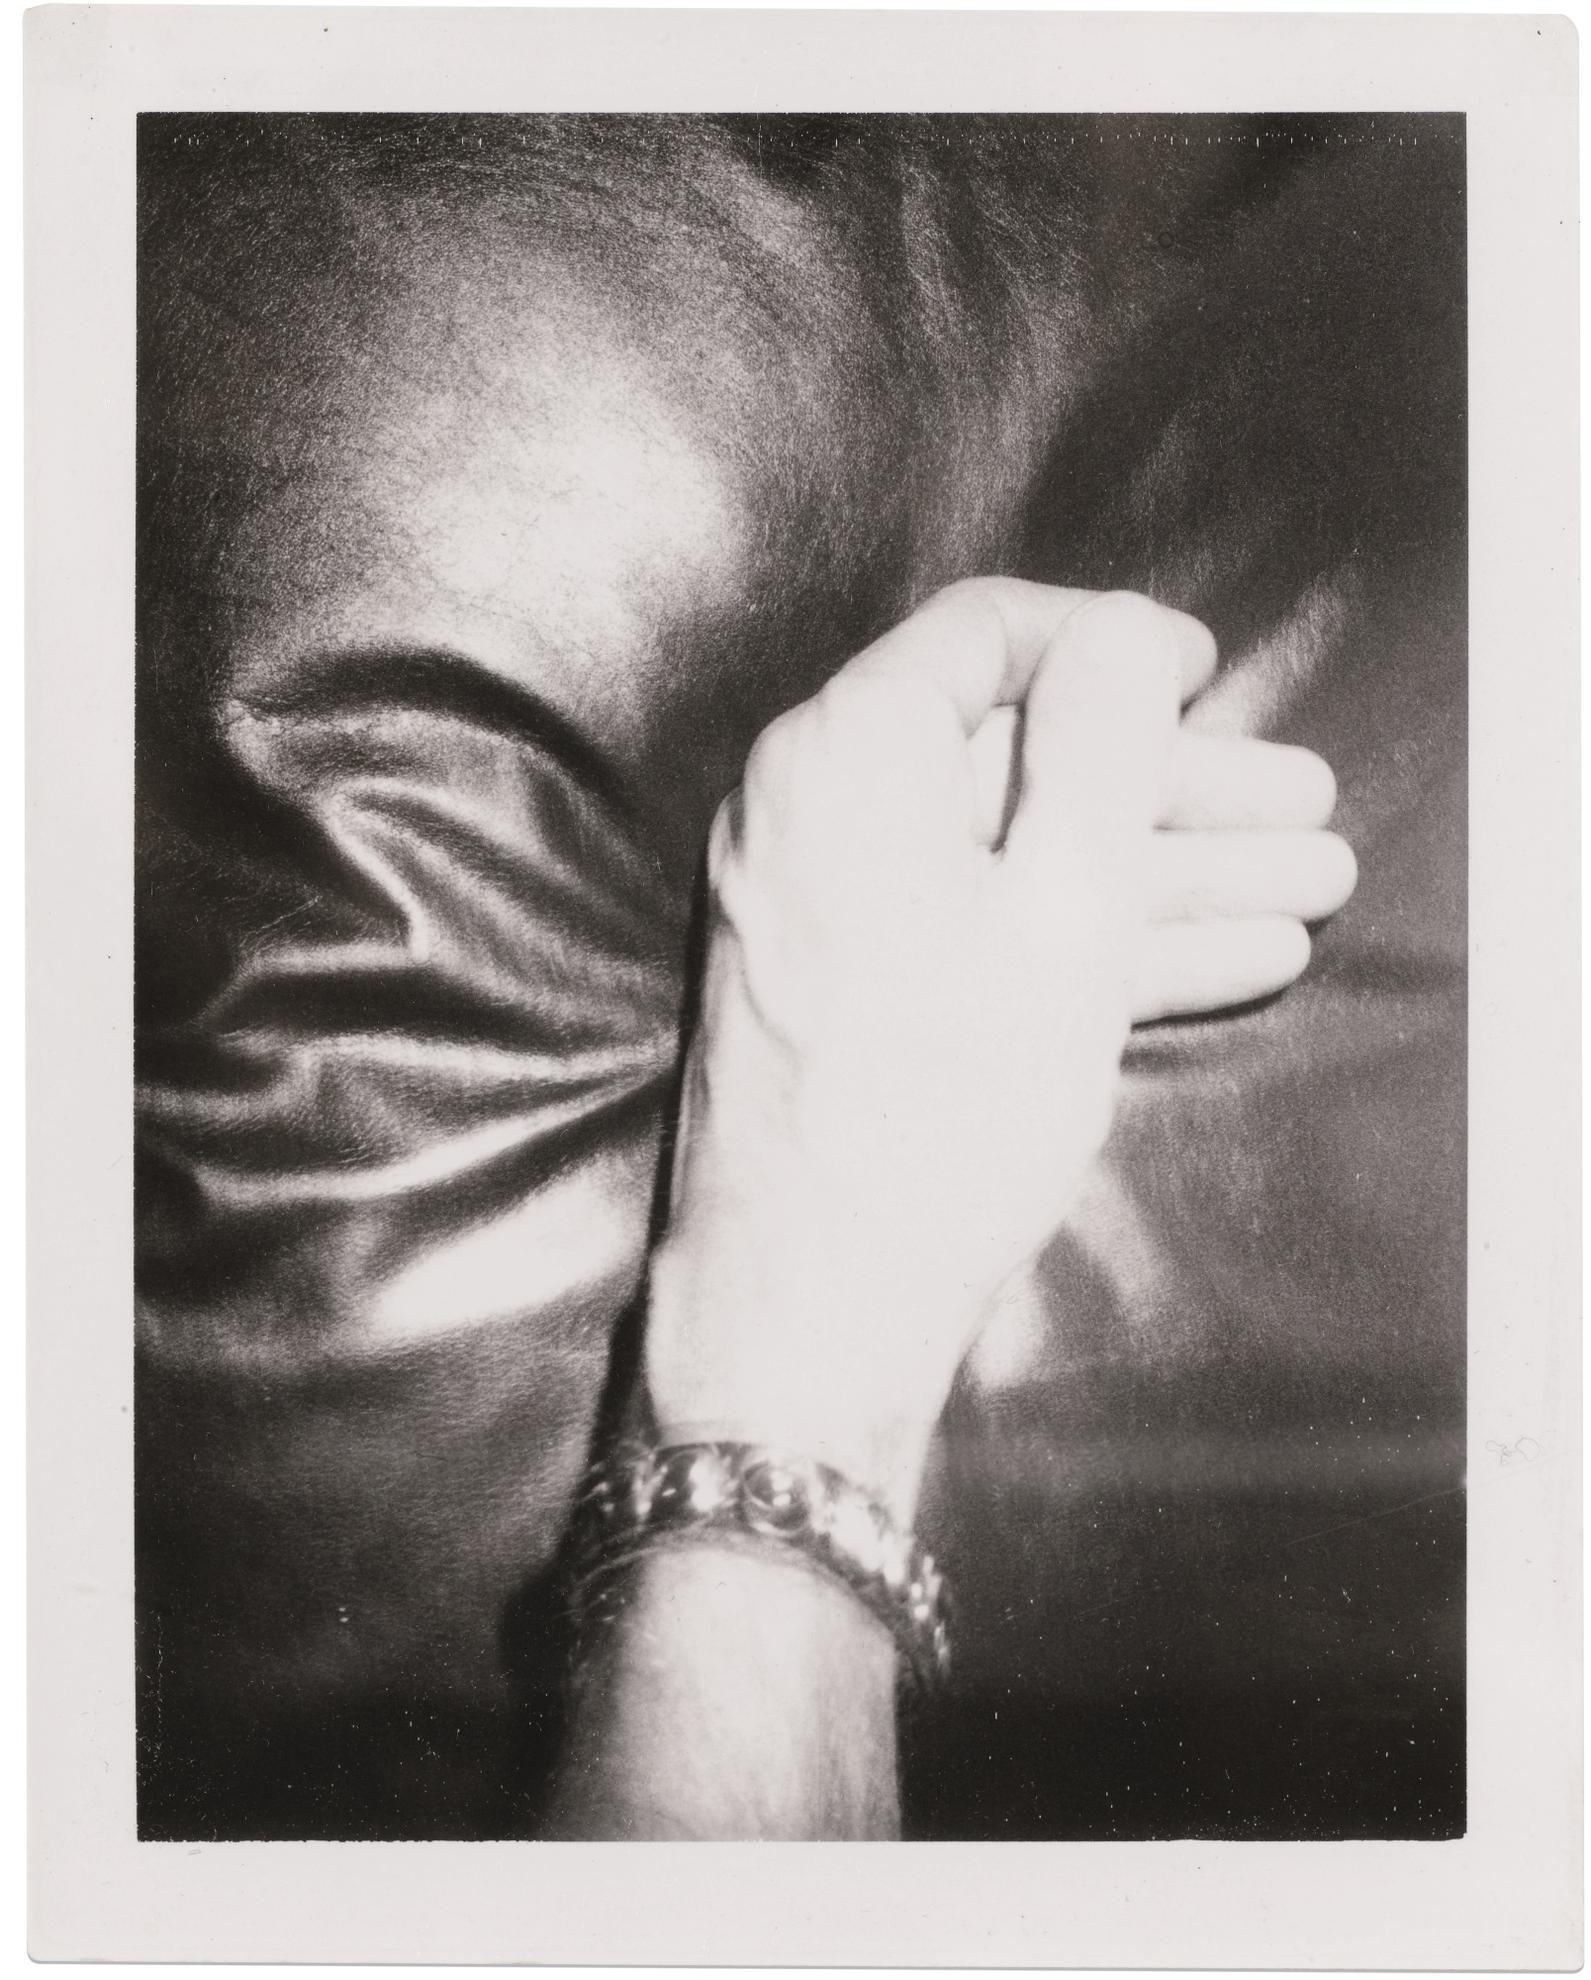 Robert Mapplethorpe-Self Portrait-1973